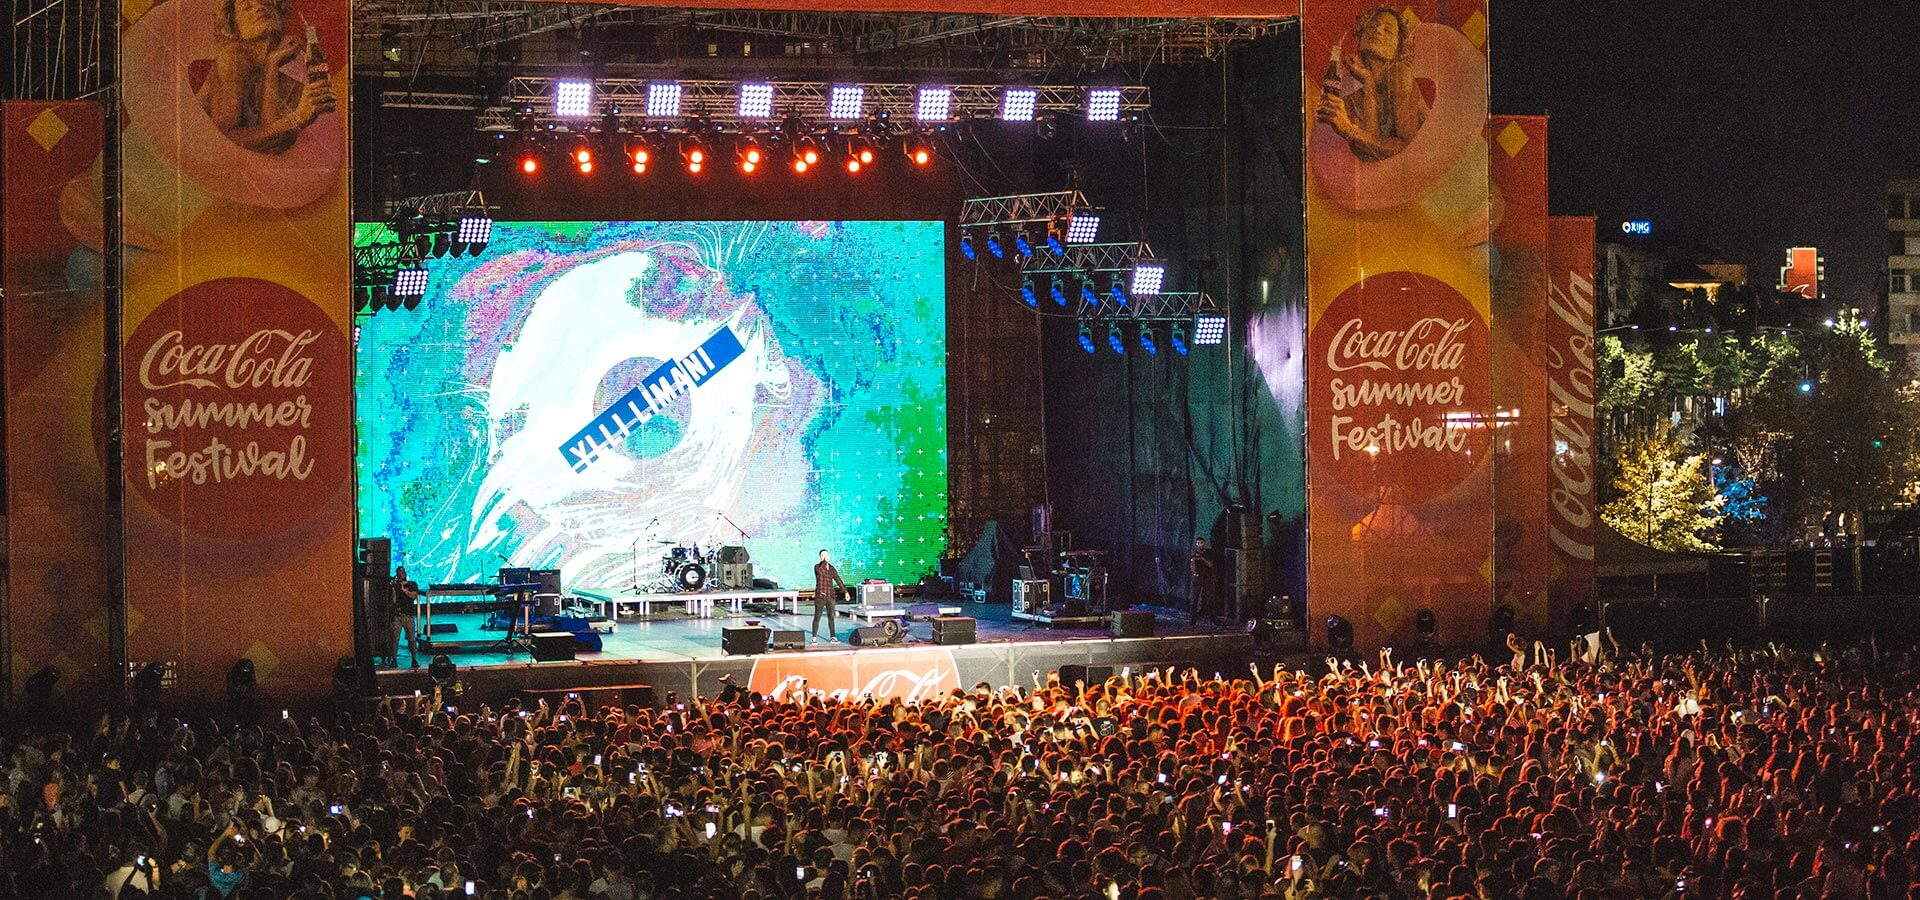 Ylli Limani ne Coca-Cola Summer Fest 2018